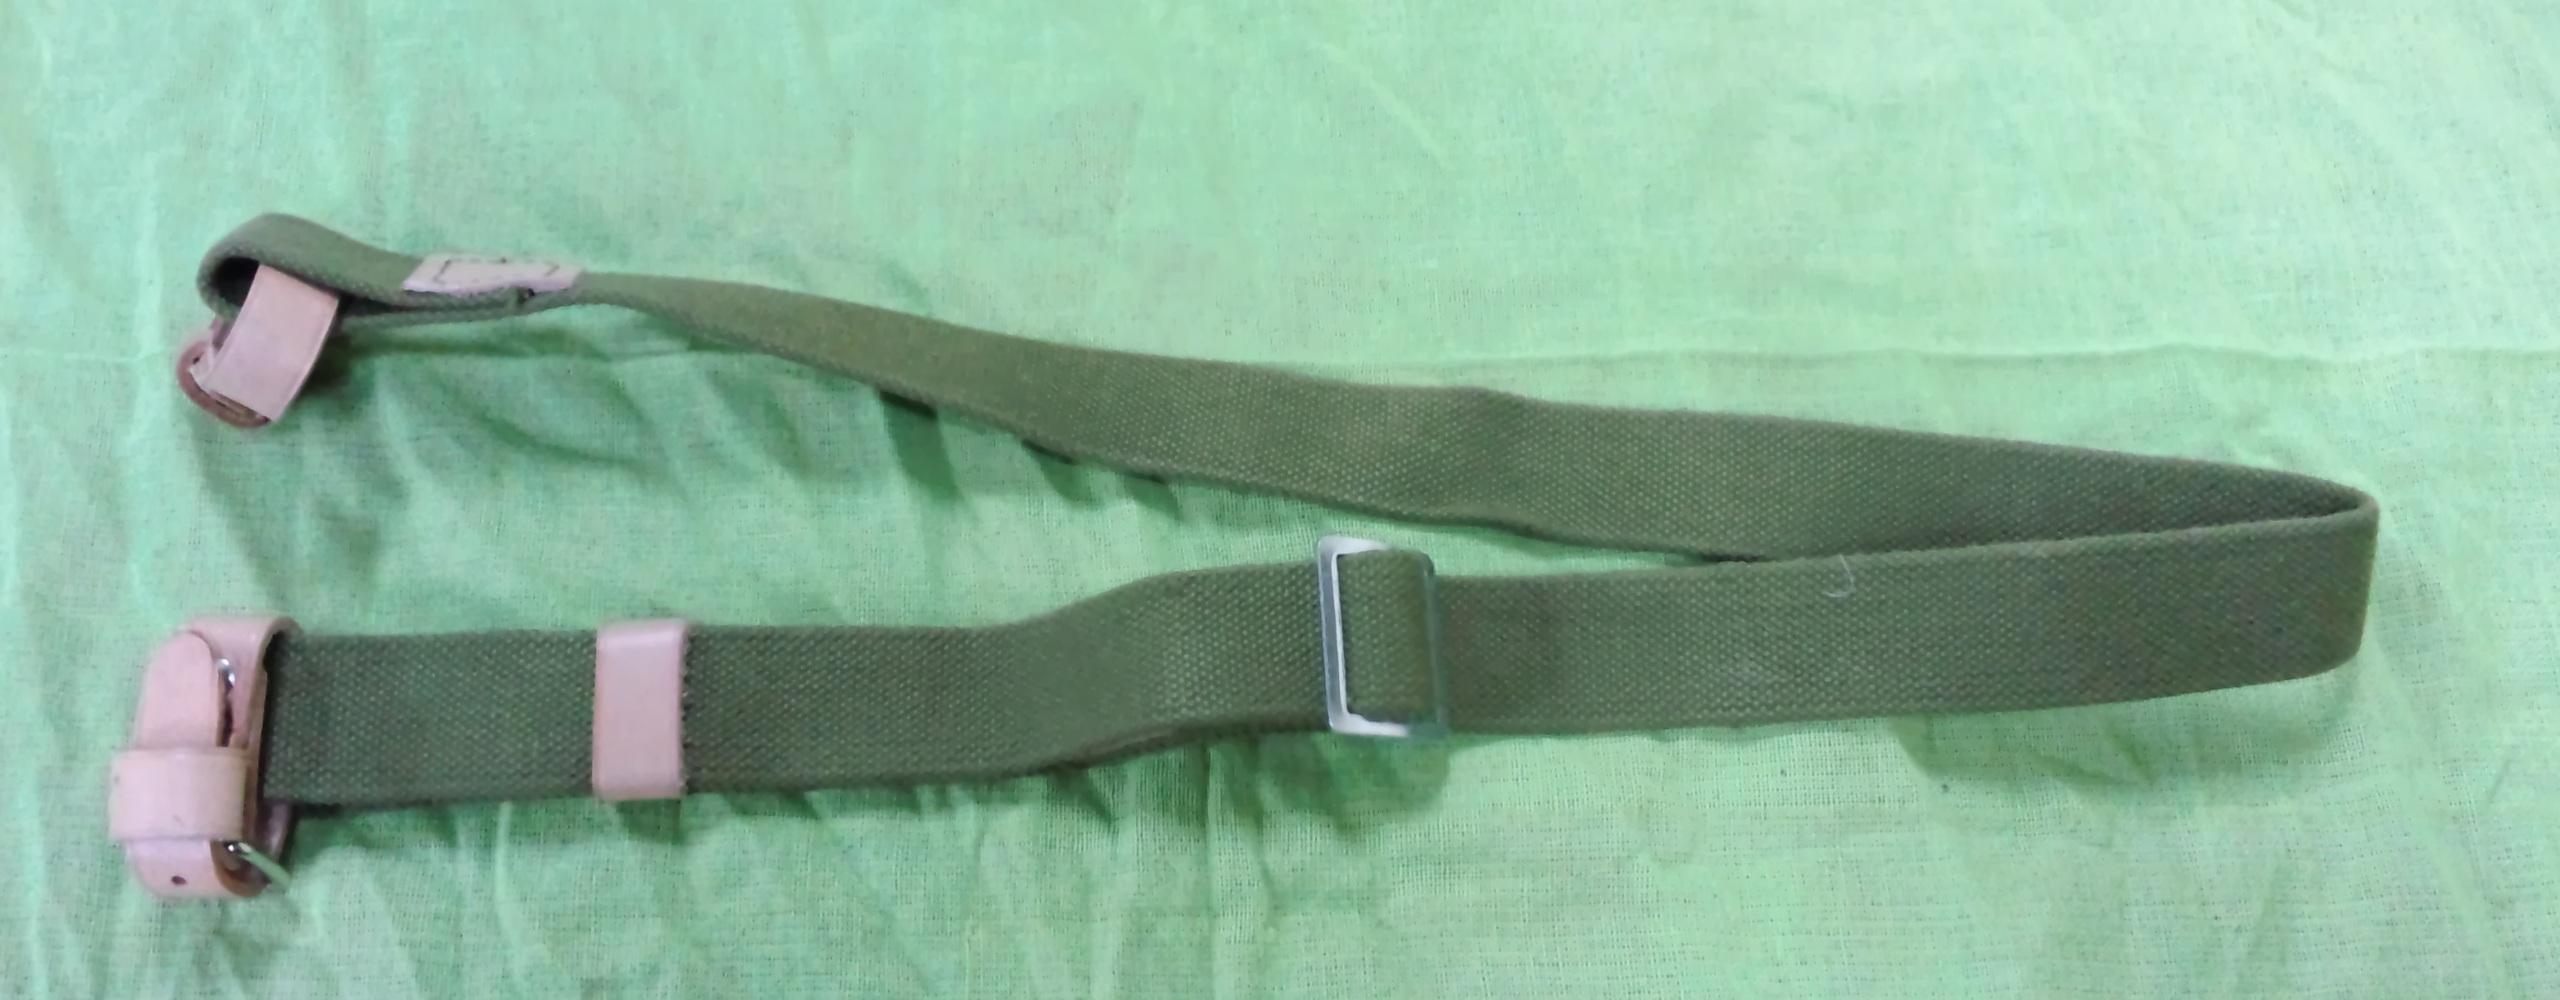 ZETA-LAB製 モシンナガンM1891/44用スリング